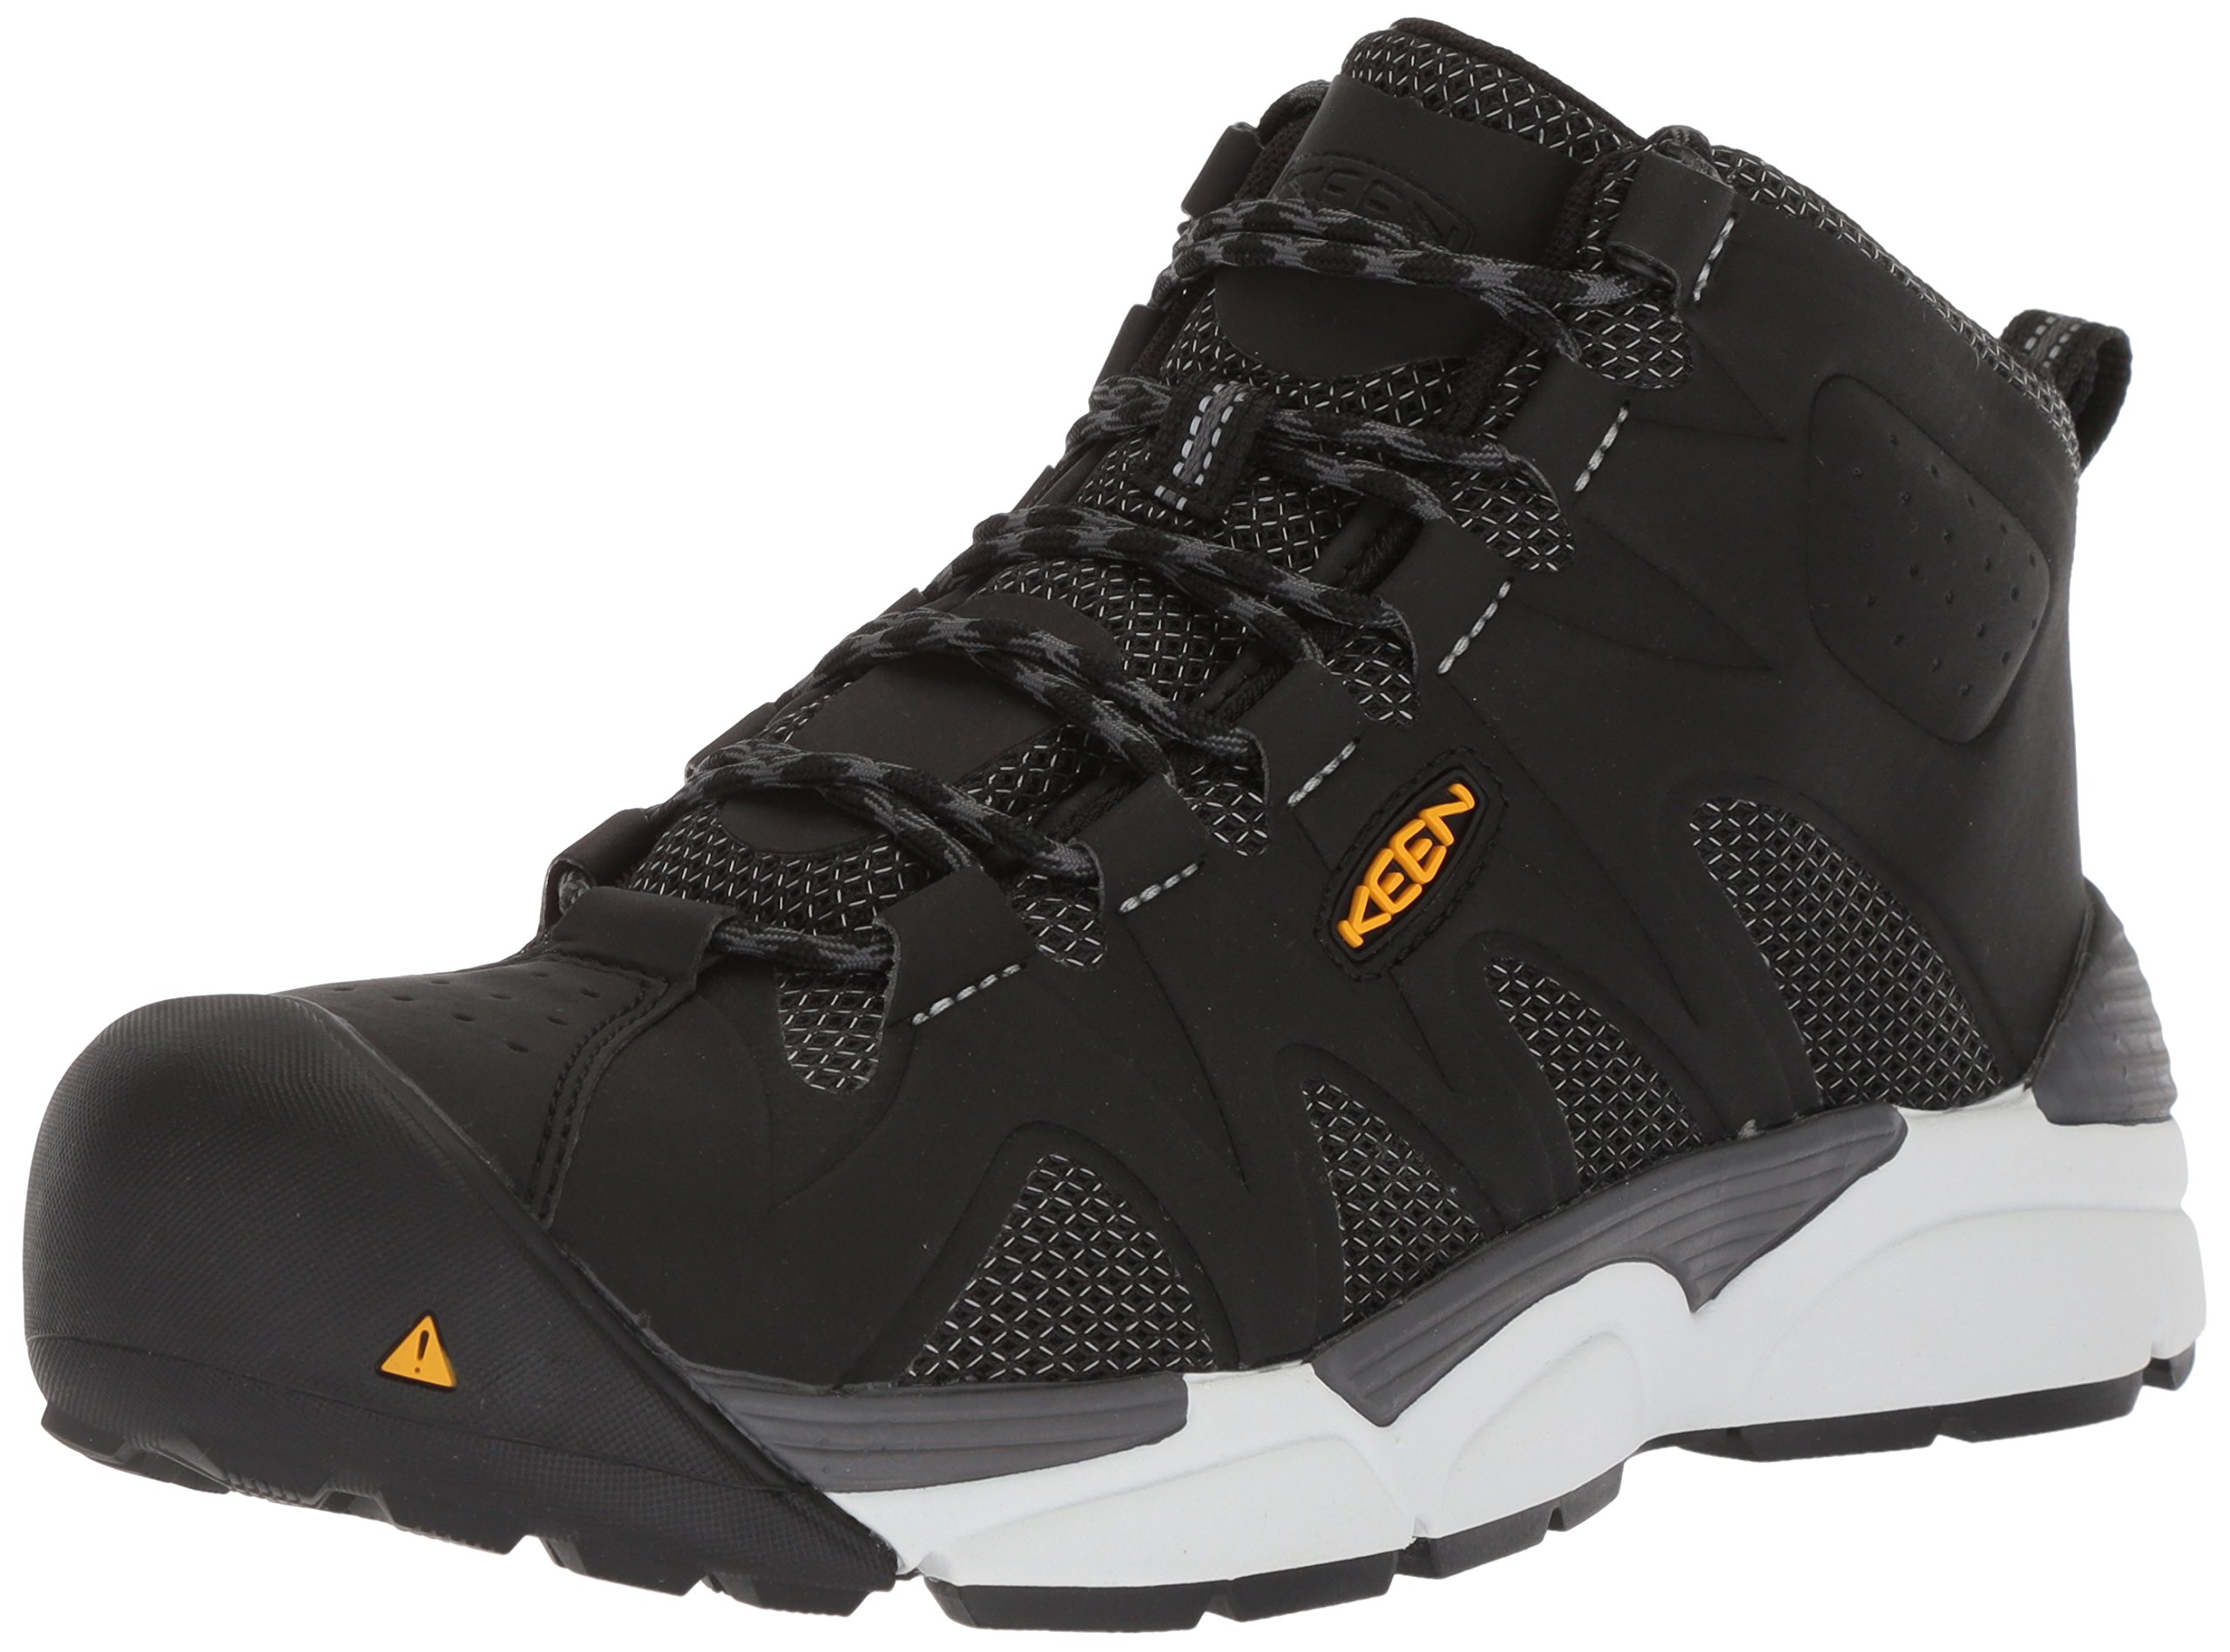 KEEN Utility Men's San Antonio Industrial Shoe, Black/Silver, 11 D US